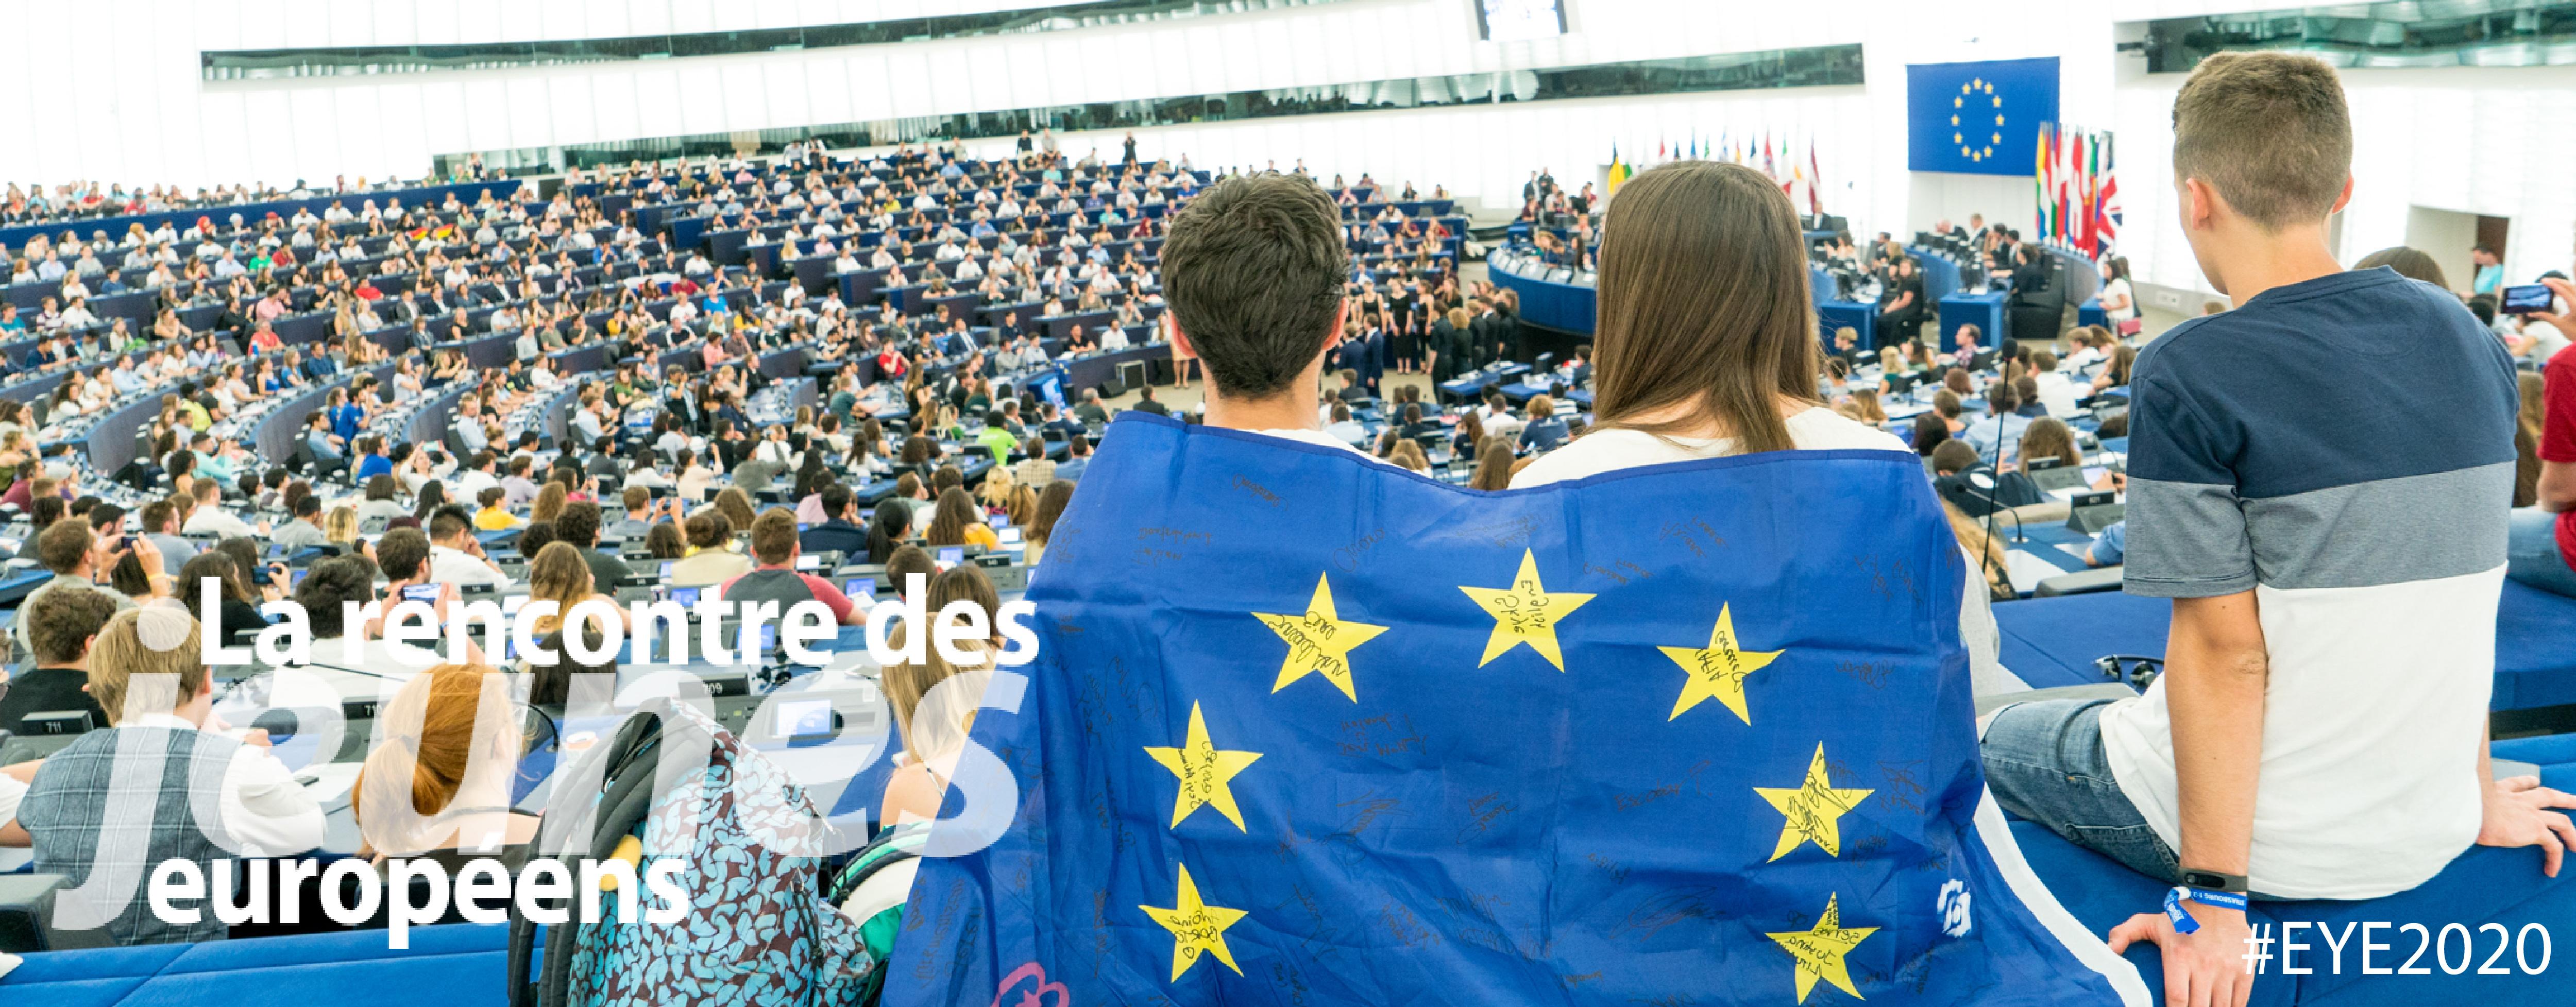 EYE2020 Banner